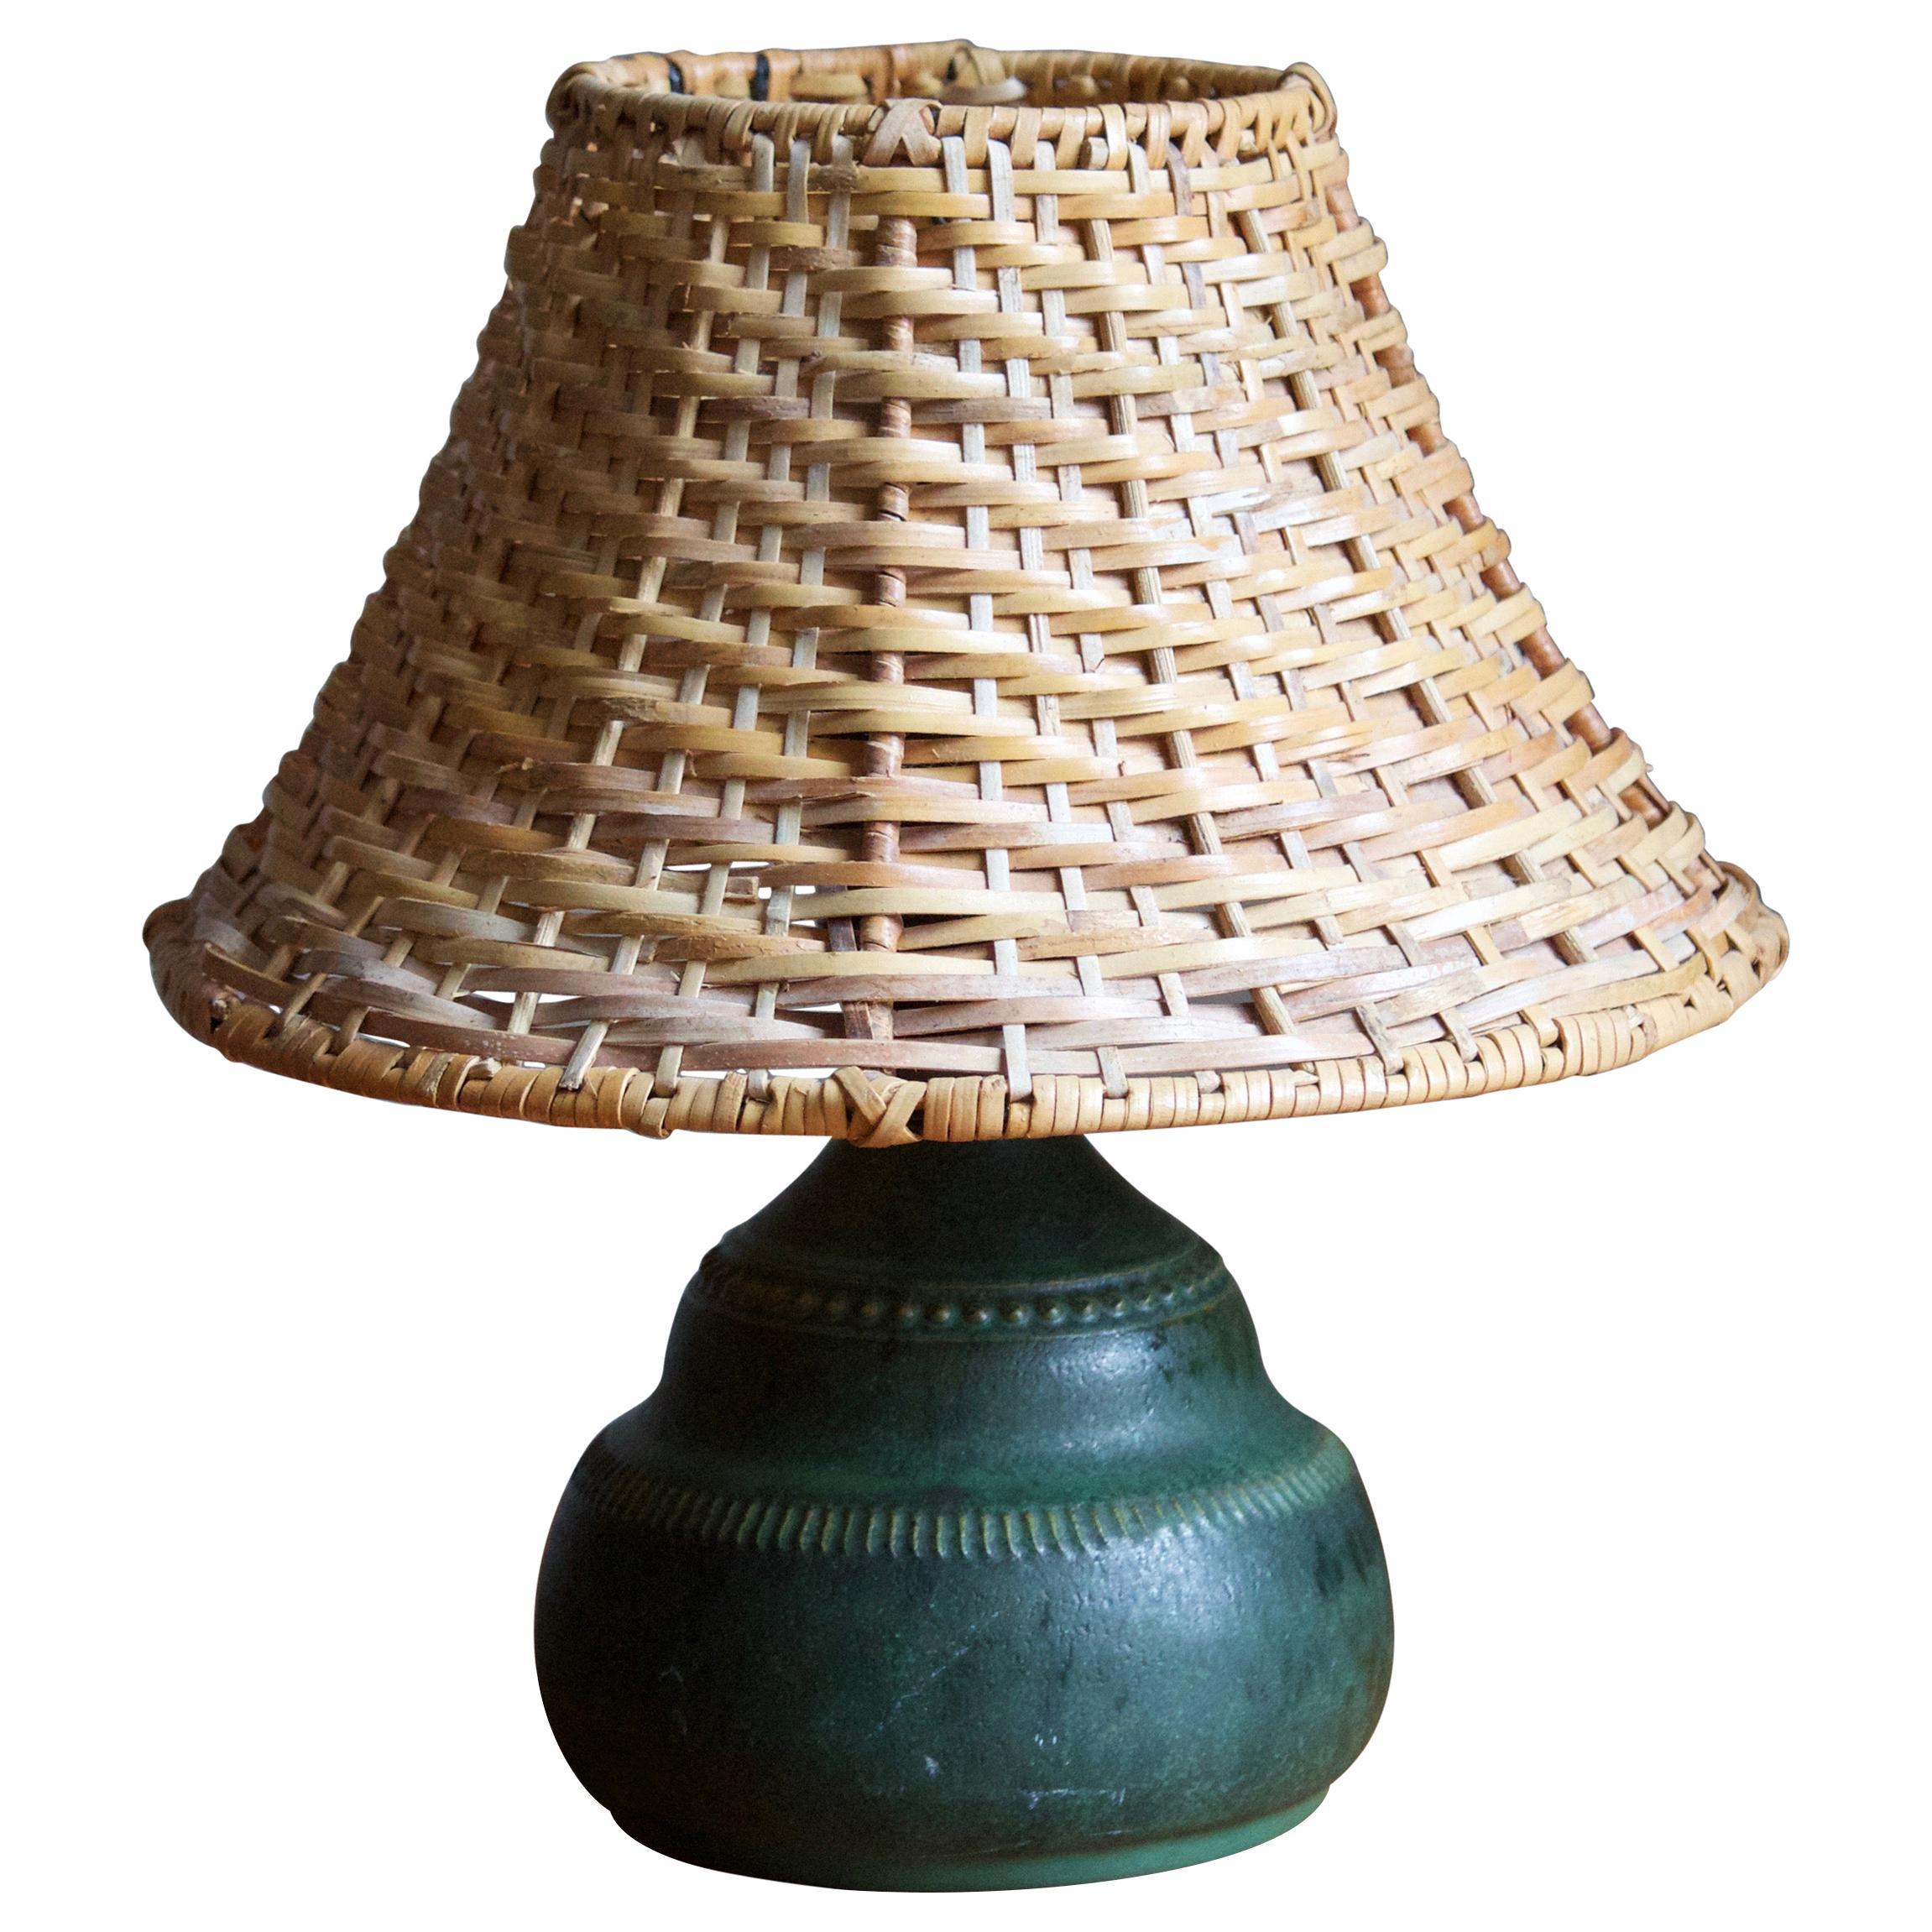 Klase Höganäs, Table Lamp, Green Glazed Stoneware, Rattan, Sweden, 1950s